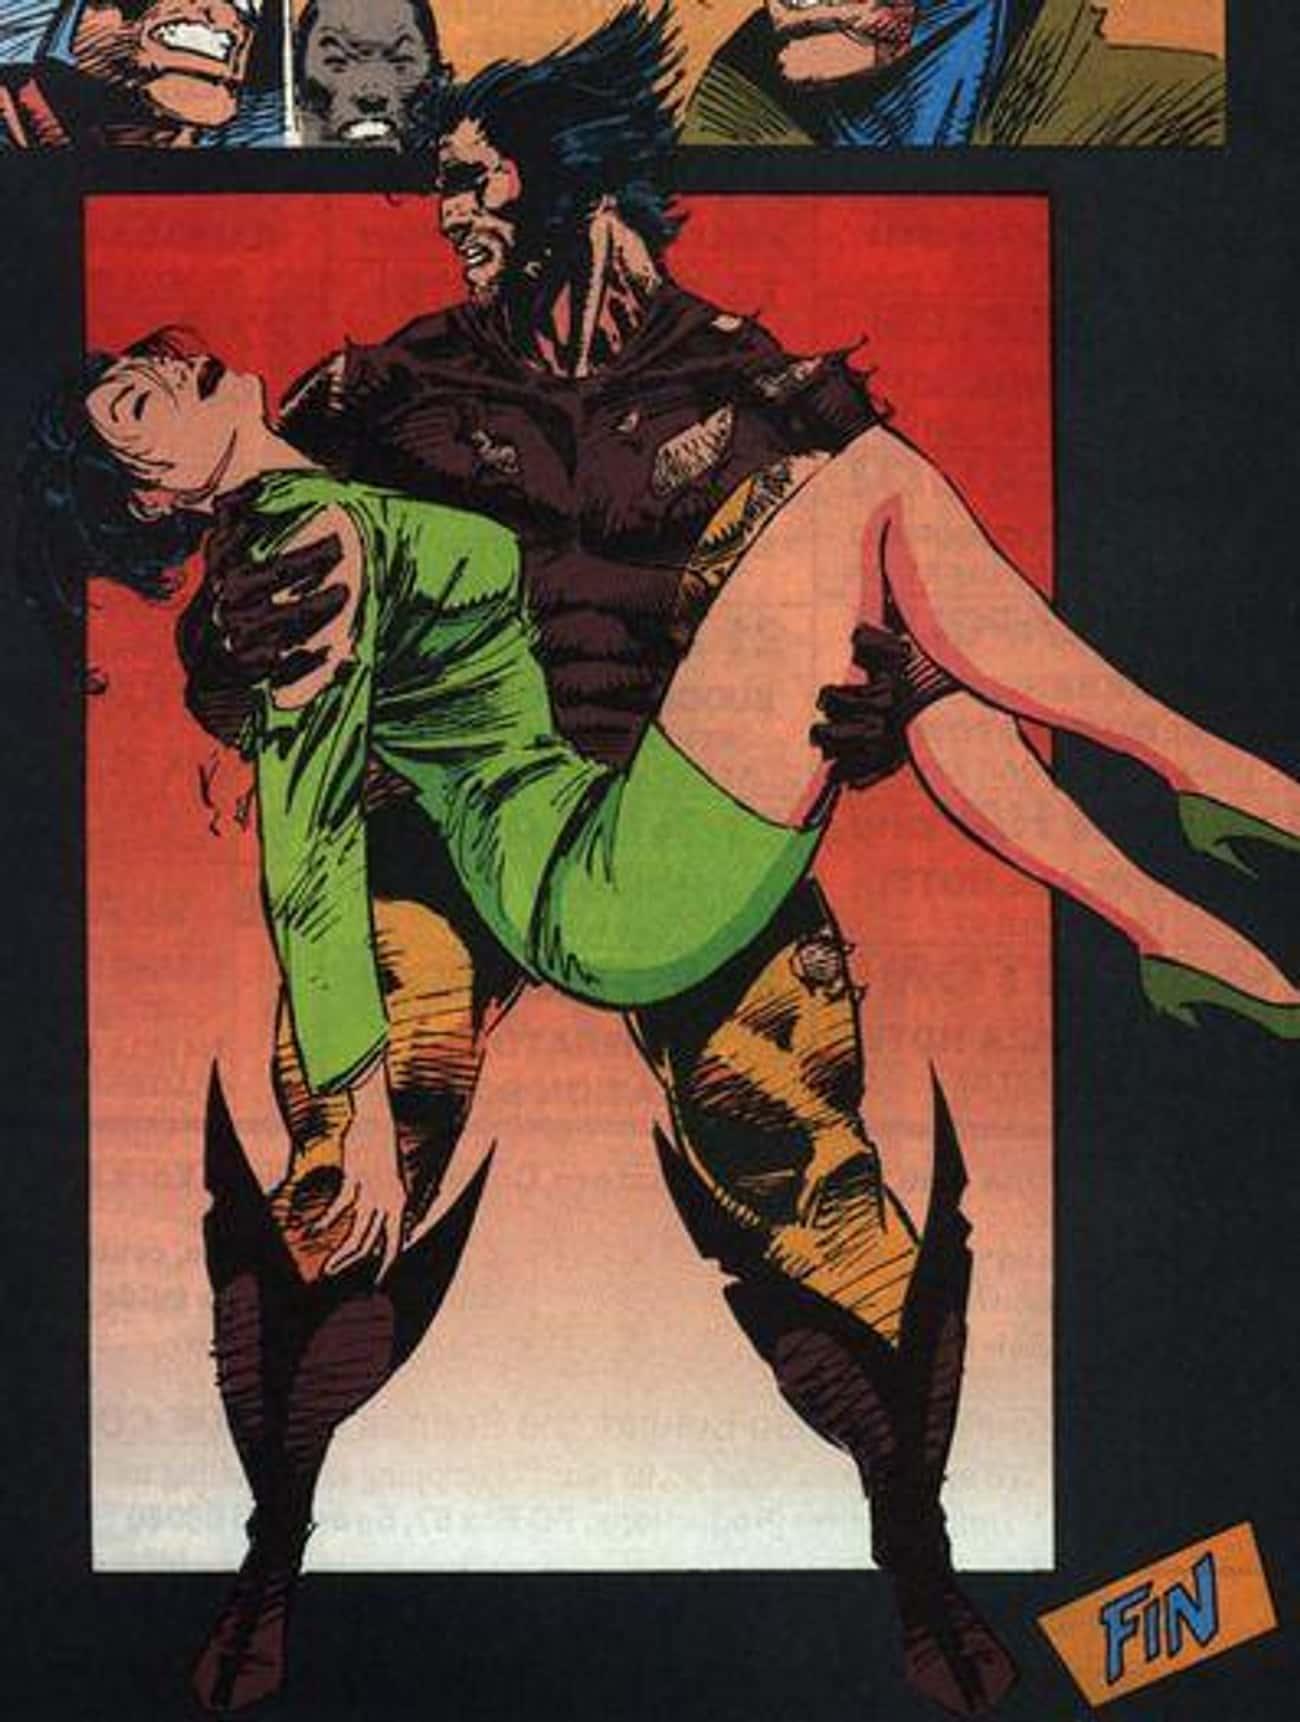 Mariko Yashida is listed (or ranked) 2 on the list 10 Times Wolverine Went Berserk and Killed Innocent People